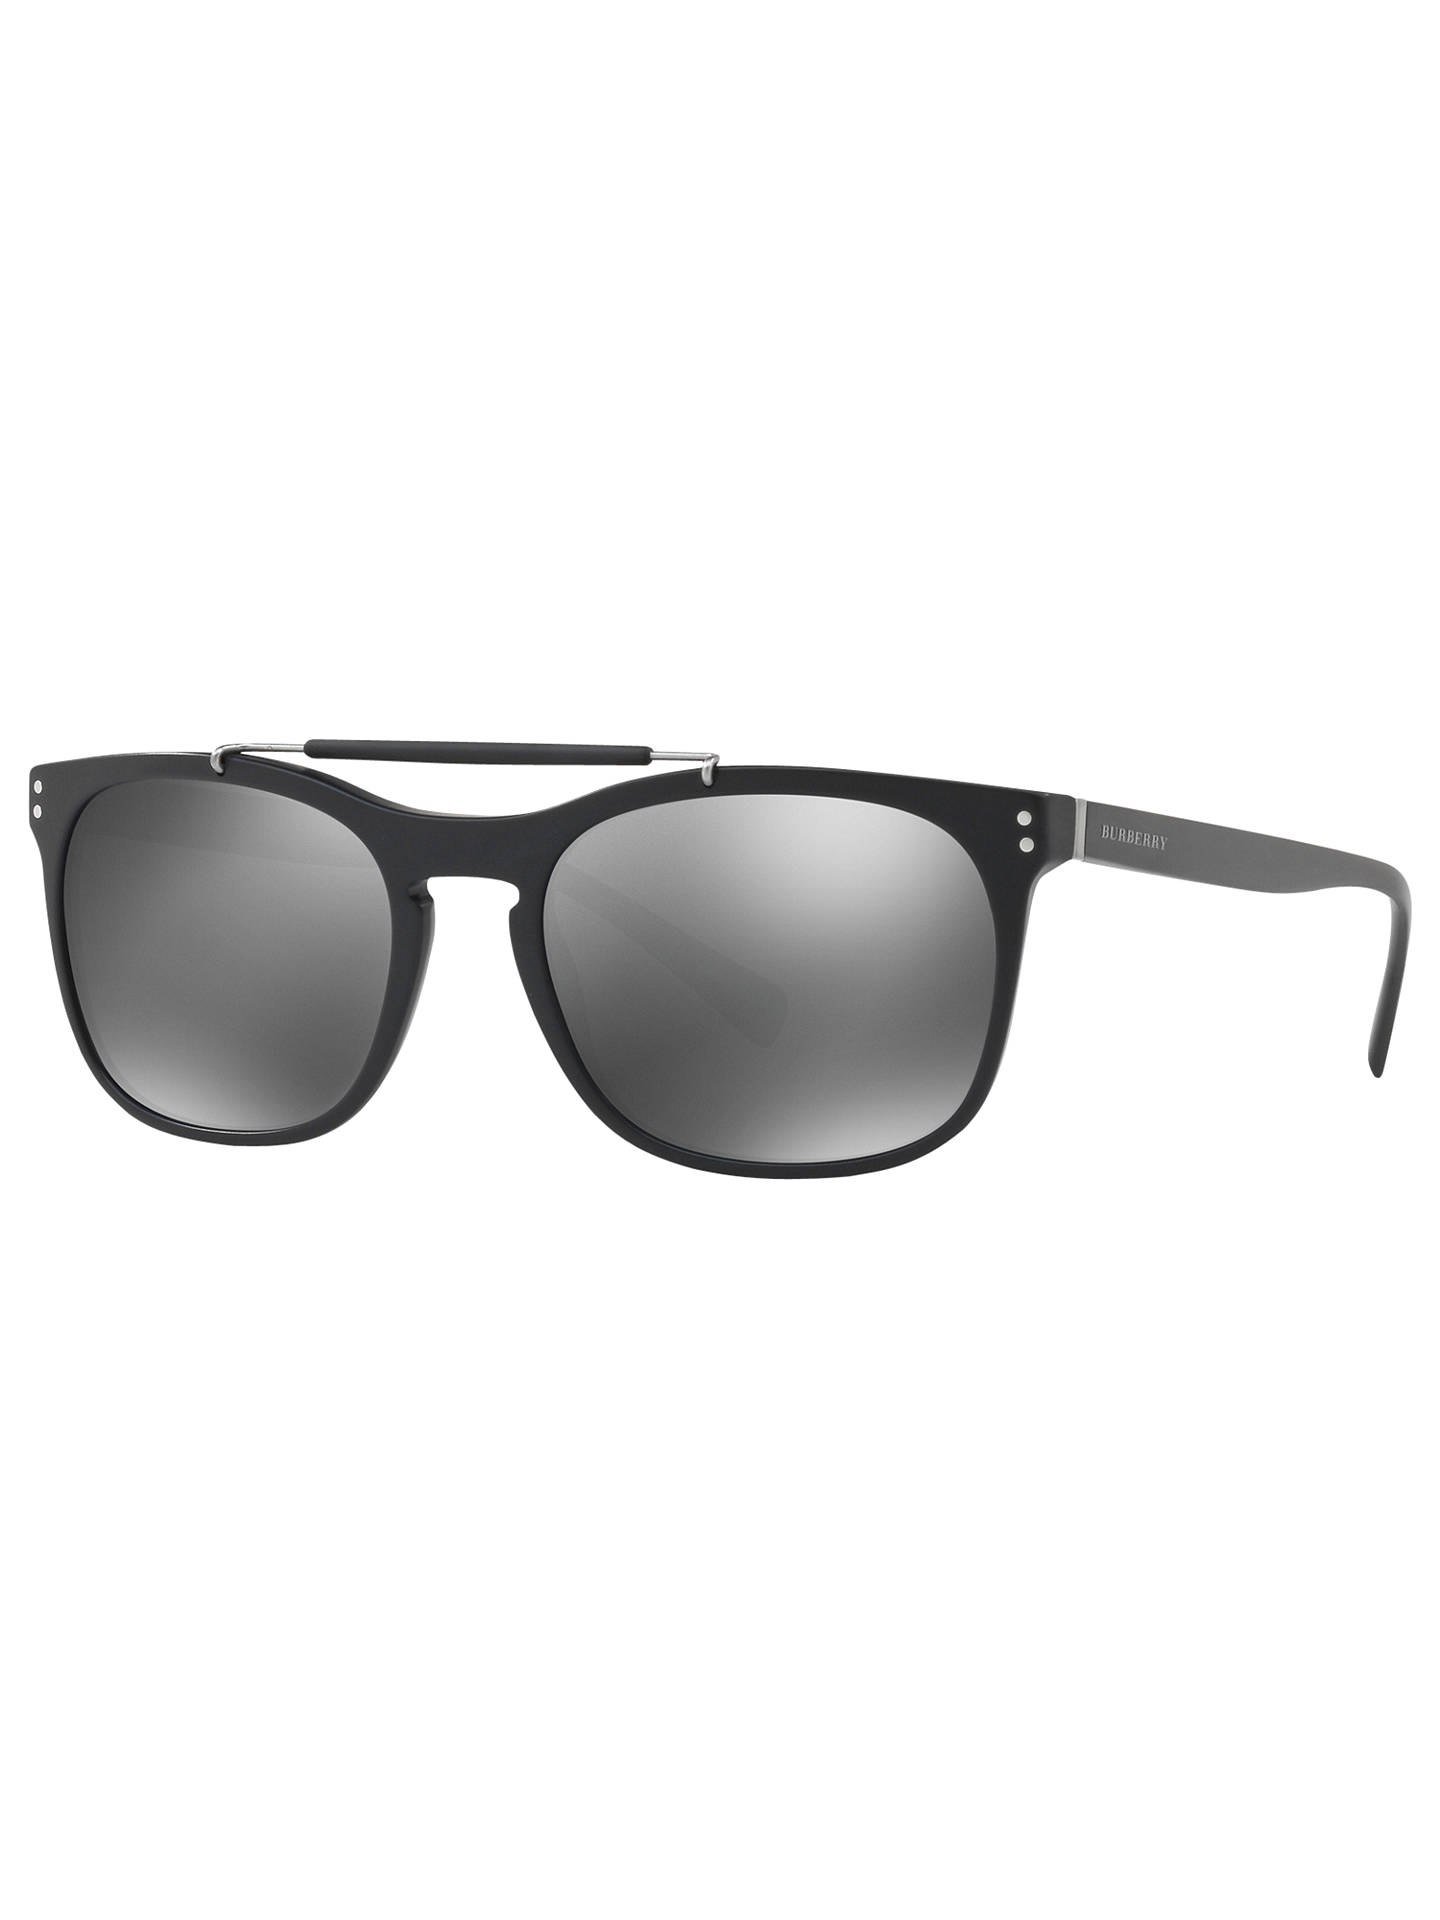 94c21ae6779 Buy Burberry BE4244 Square Sunglasses